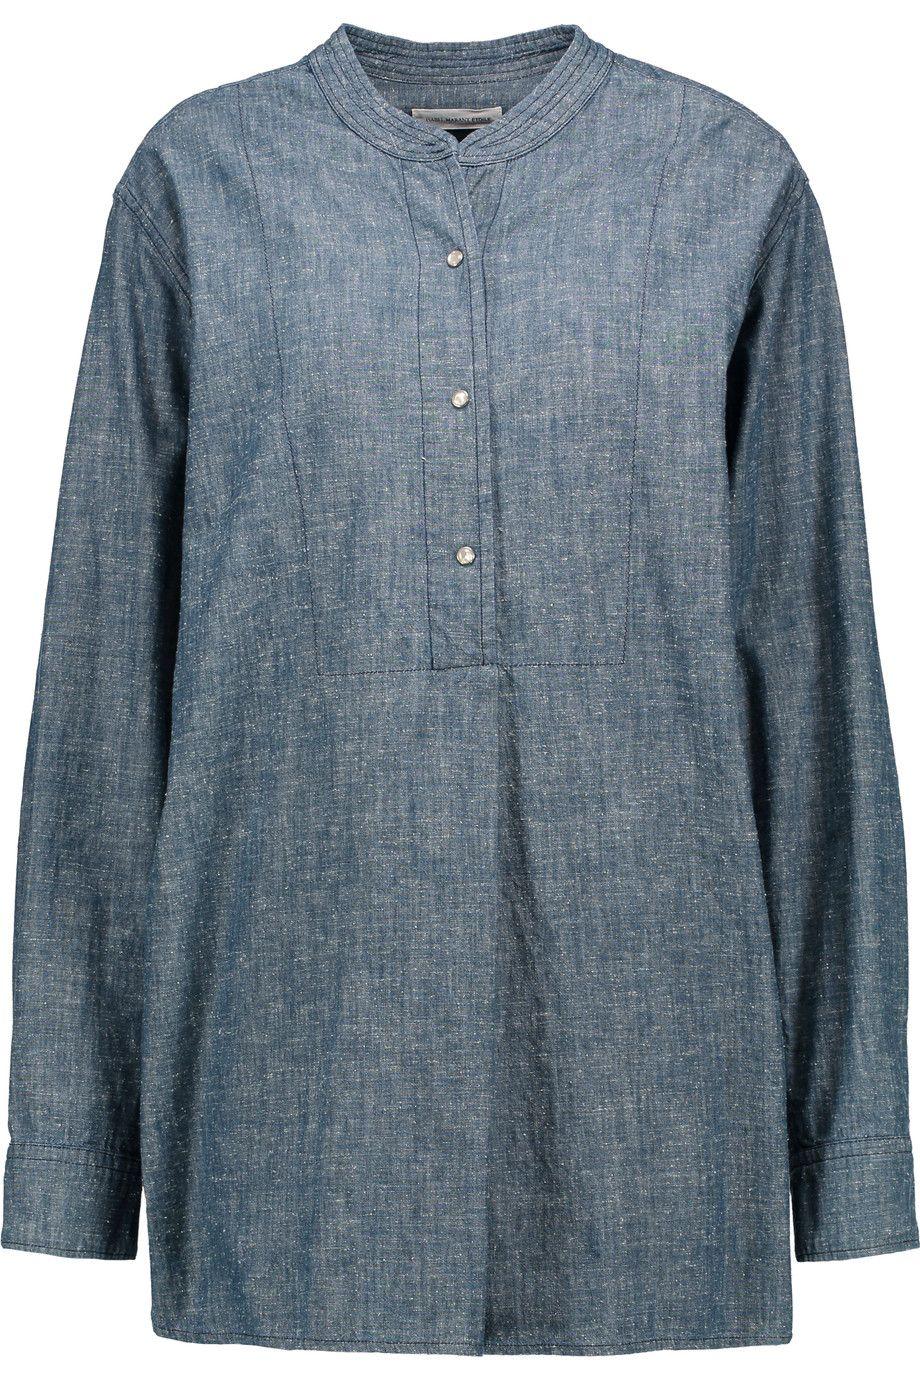 ETOILE ISABEL MARANT Stacy cotton-chambray shirt. #etoileisabelmarant #cloth #shirt